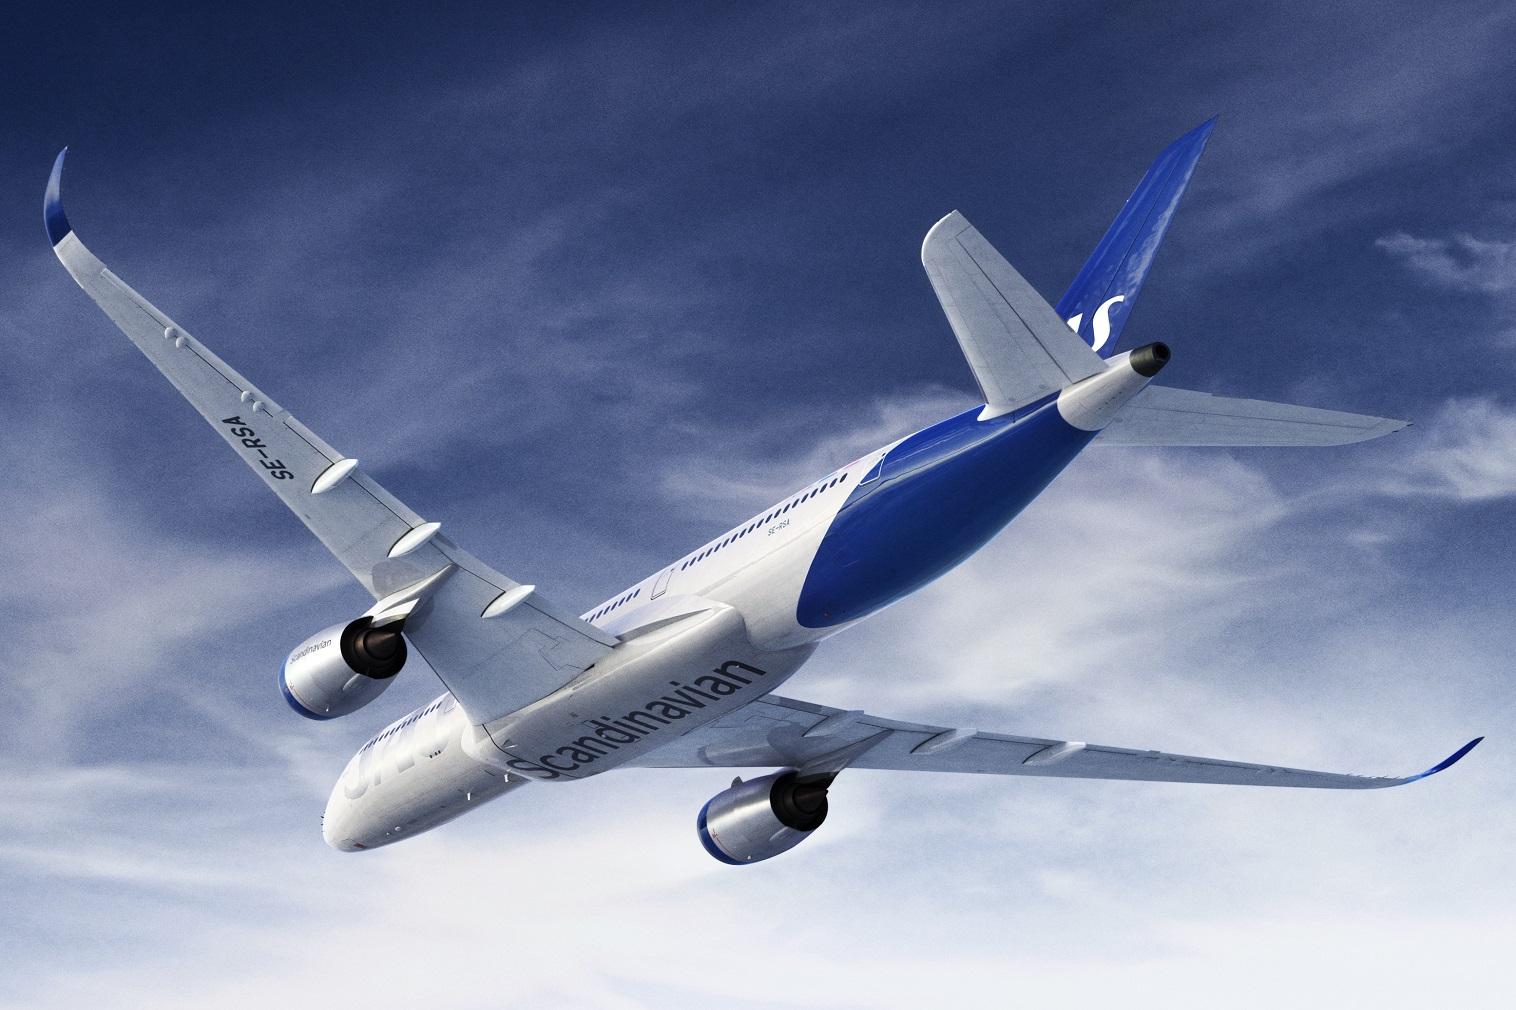 From Copenhagen, SAS is resuming international flights to Amsterdam, New York and Chicago.